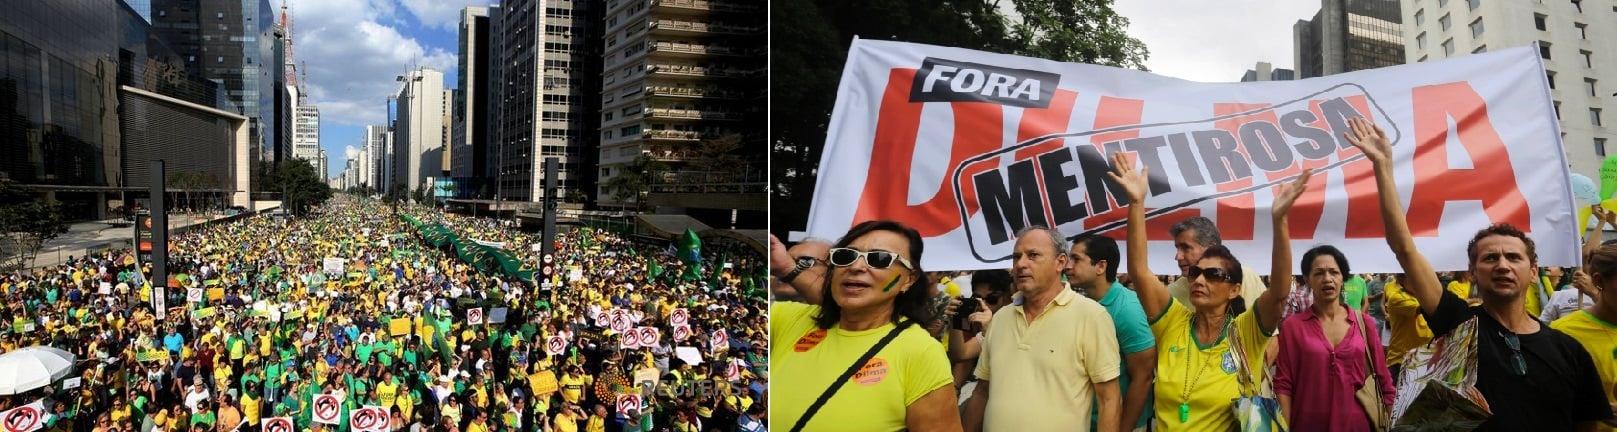 demonstrators-attend-a